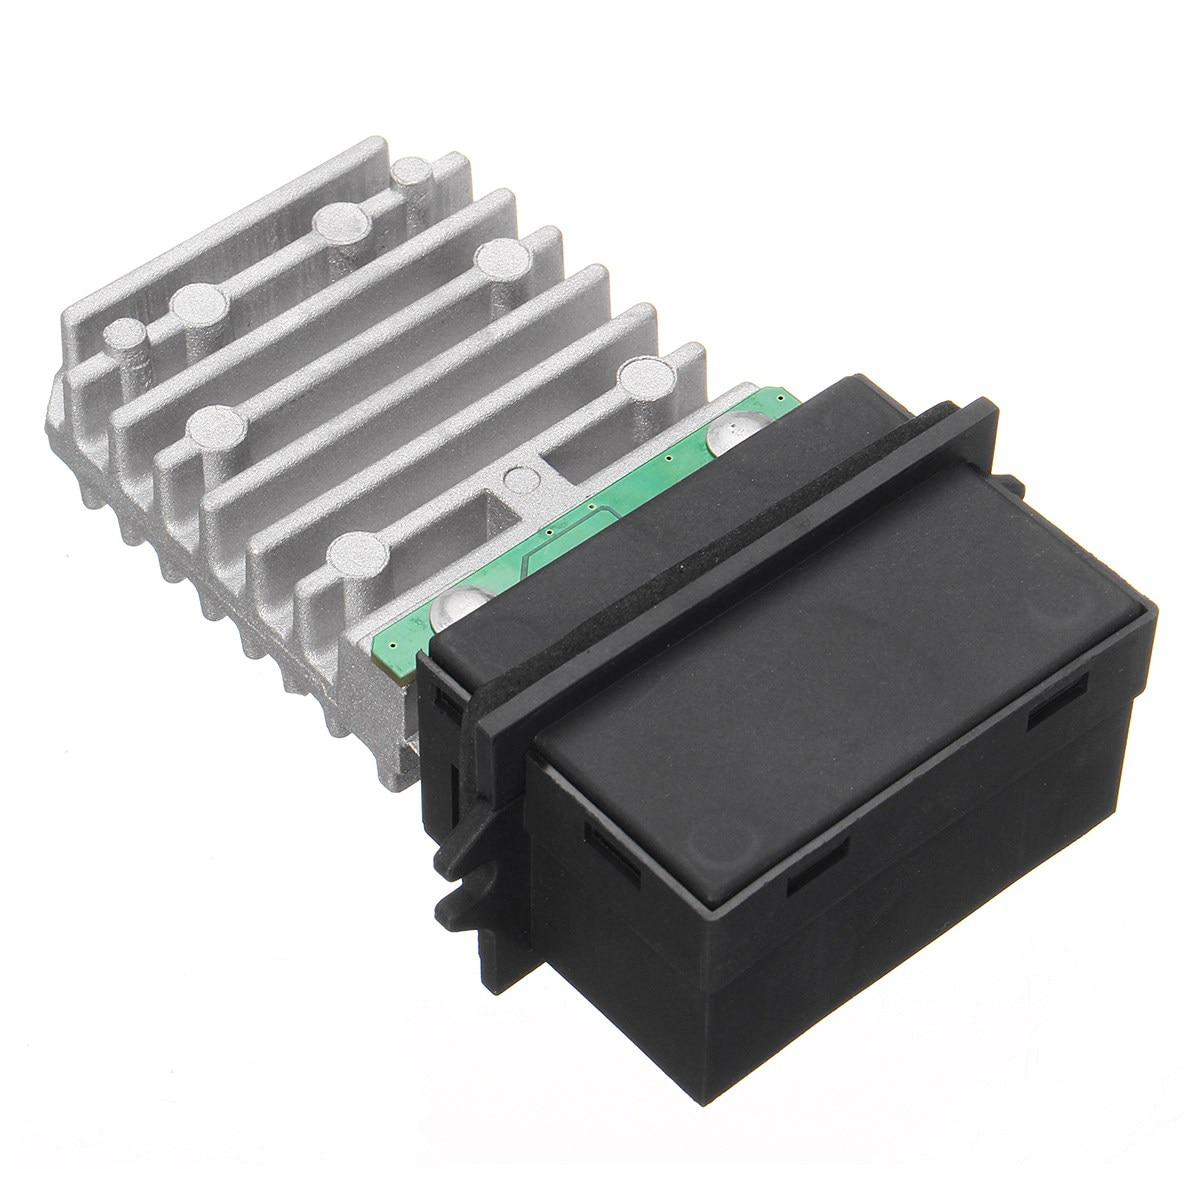 medium resolution of blower motor resistor power control module for chrysler 300m lhs for dodge intrepid oem 04734913ac 04734913ad 04734913ae